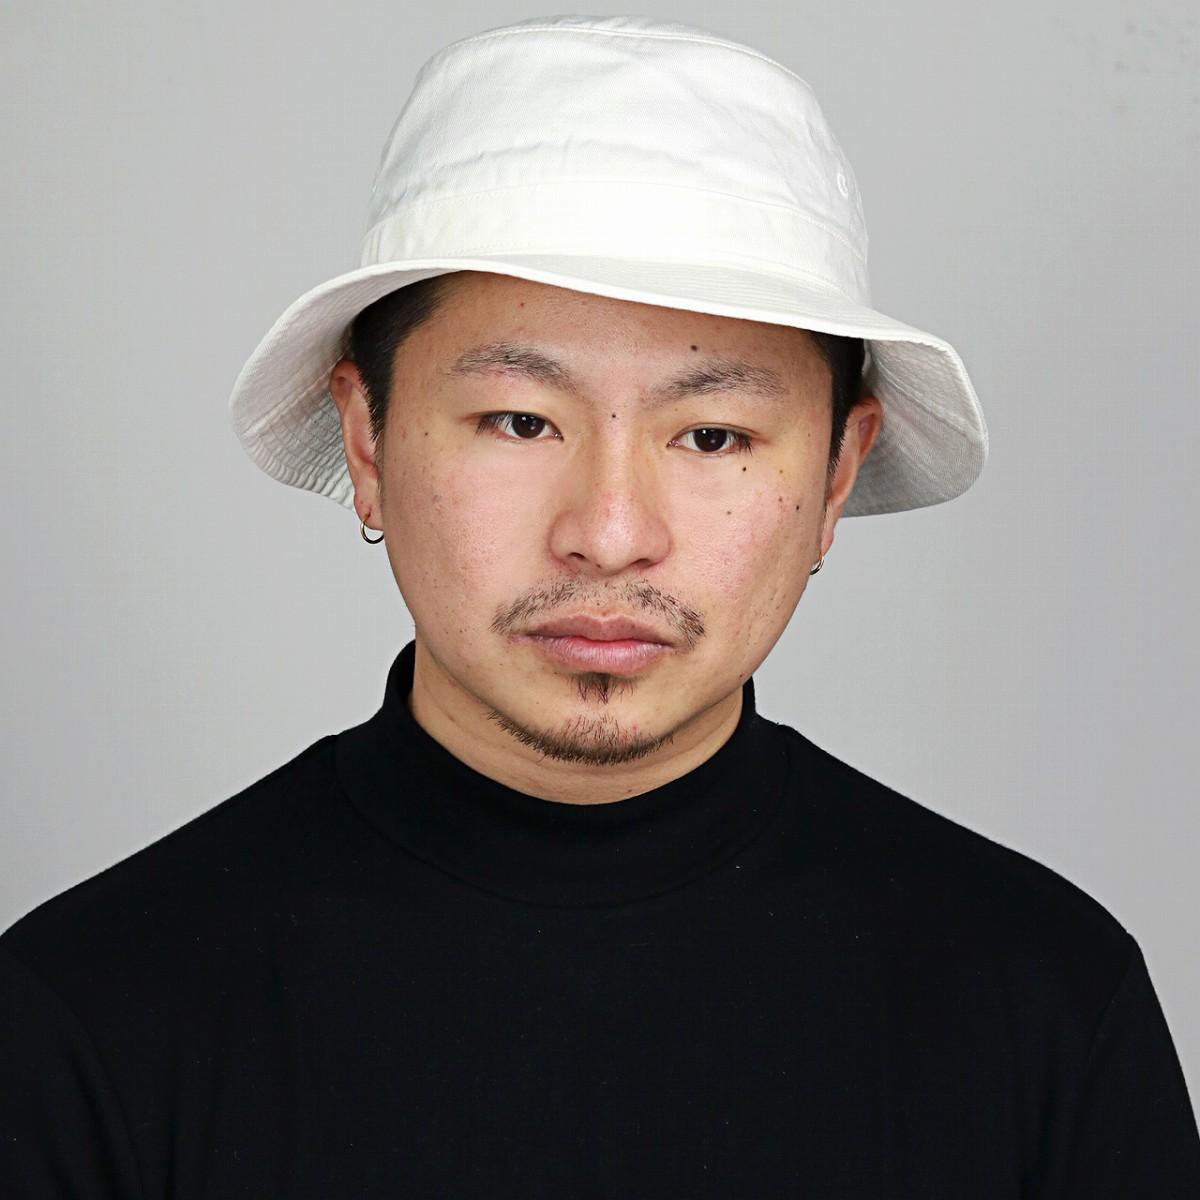 98ecfb3e42cf84 ELEHELM HAT STORE: LACOSTE bucket Hat Lacoste Hat Safari Hat white ...